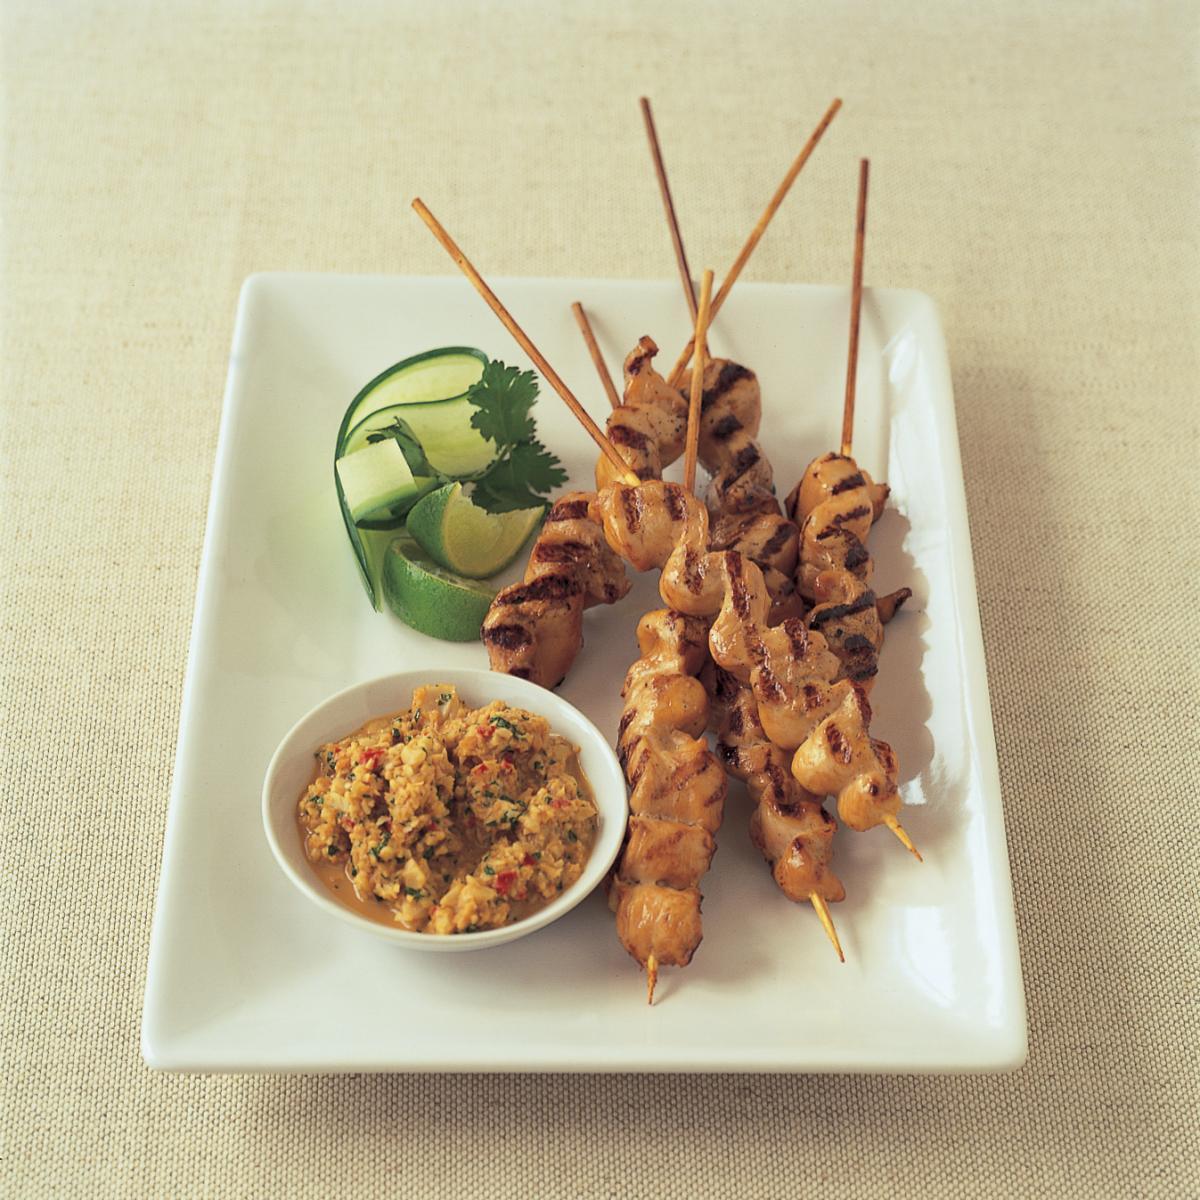 A picture of Delia's Marinated Chicken Satay with Peanut Satay Sauce recipe